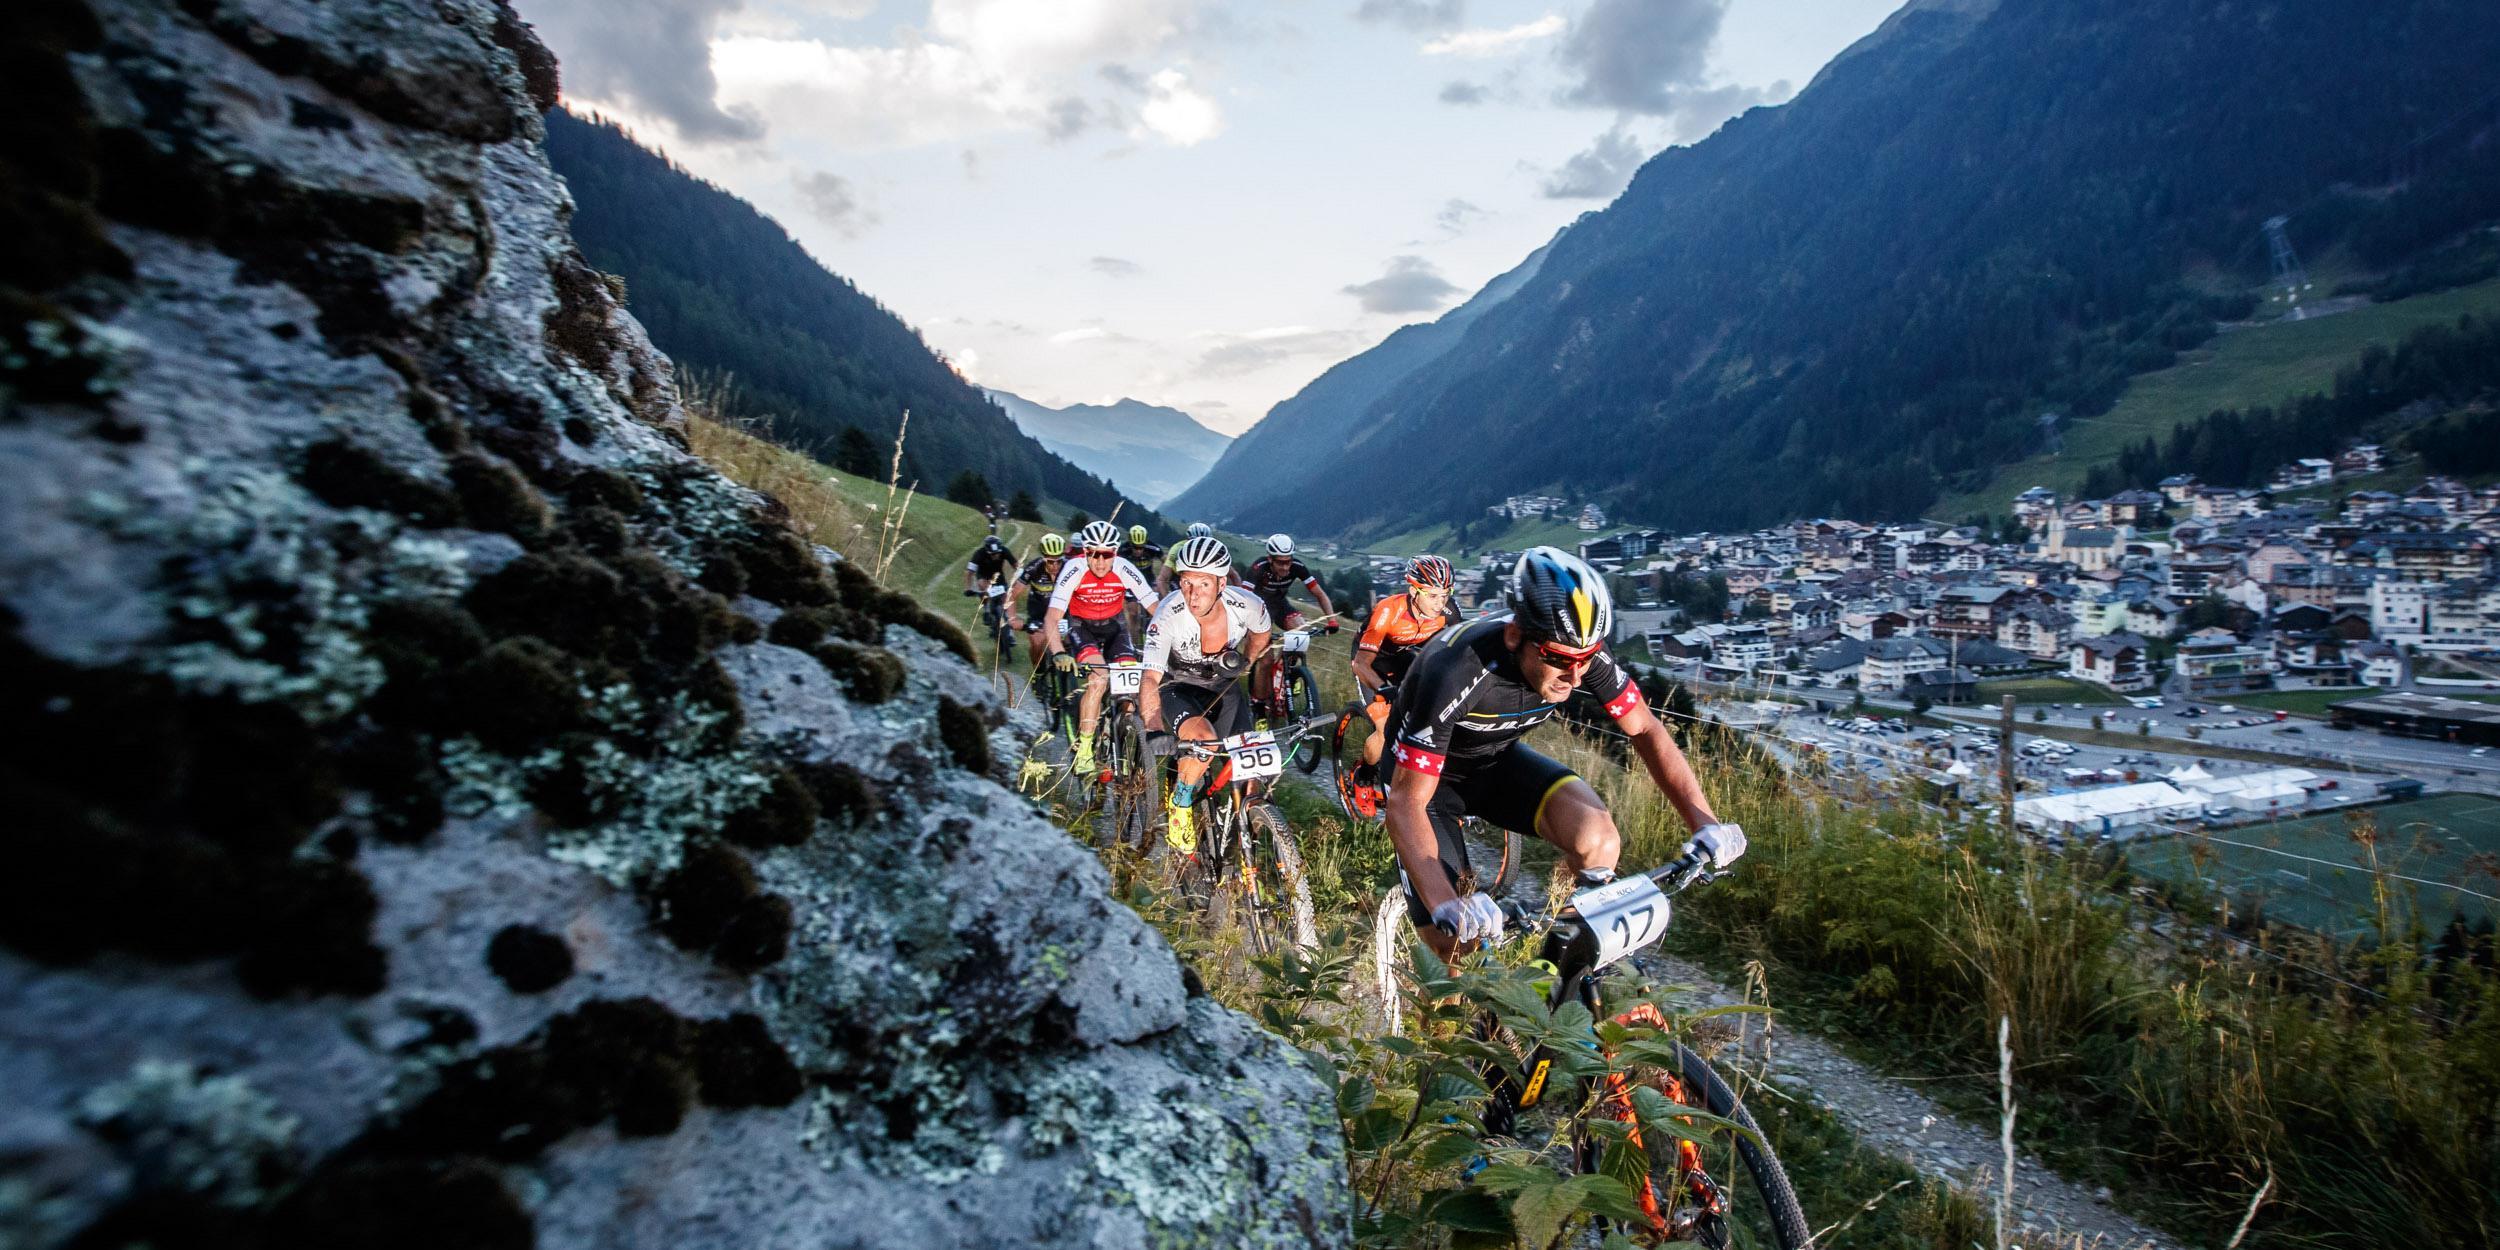 Ischgl Ironbike 2021